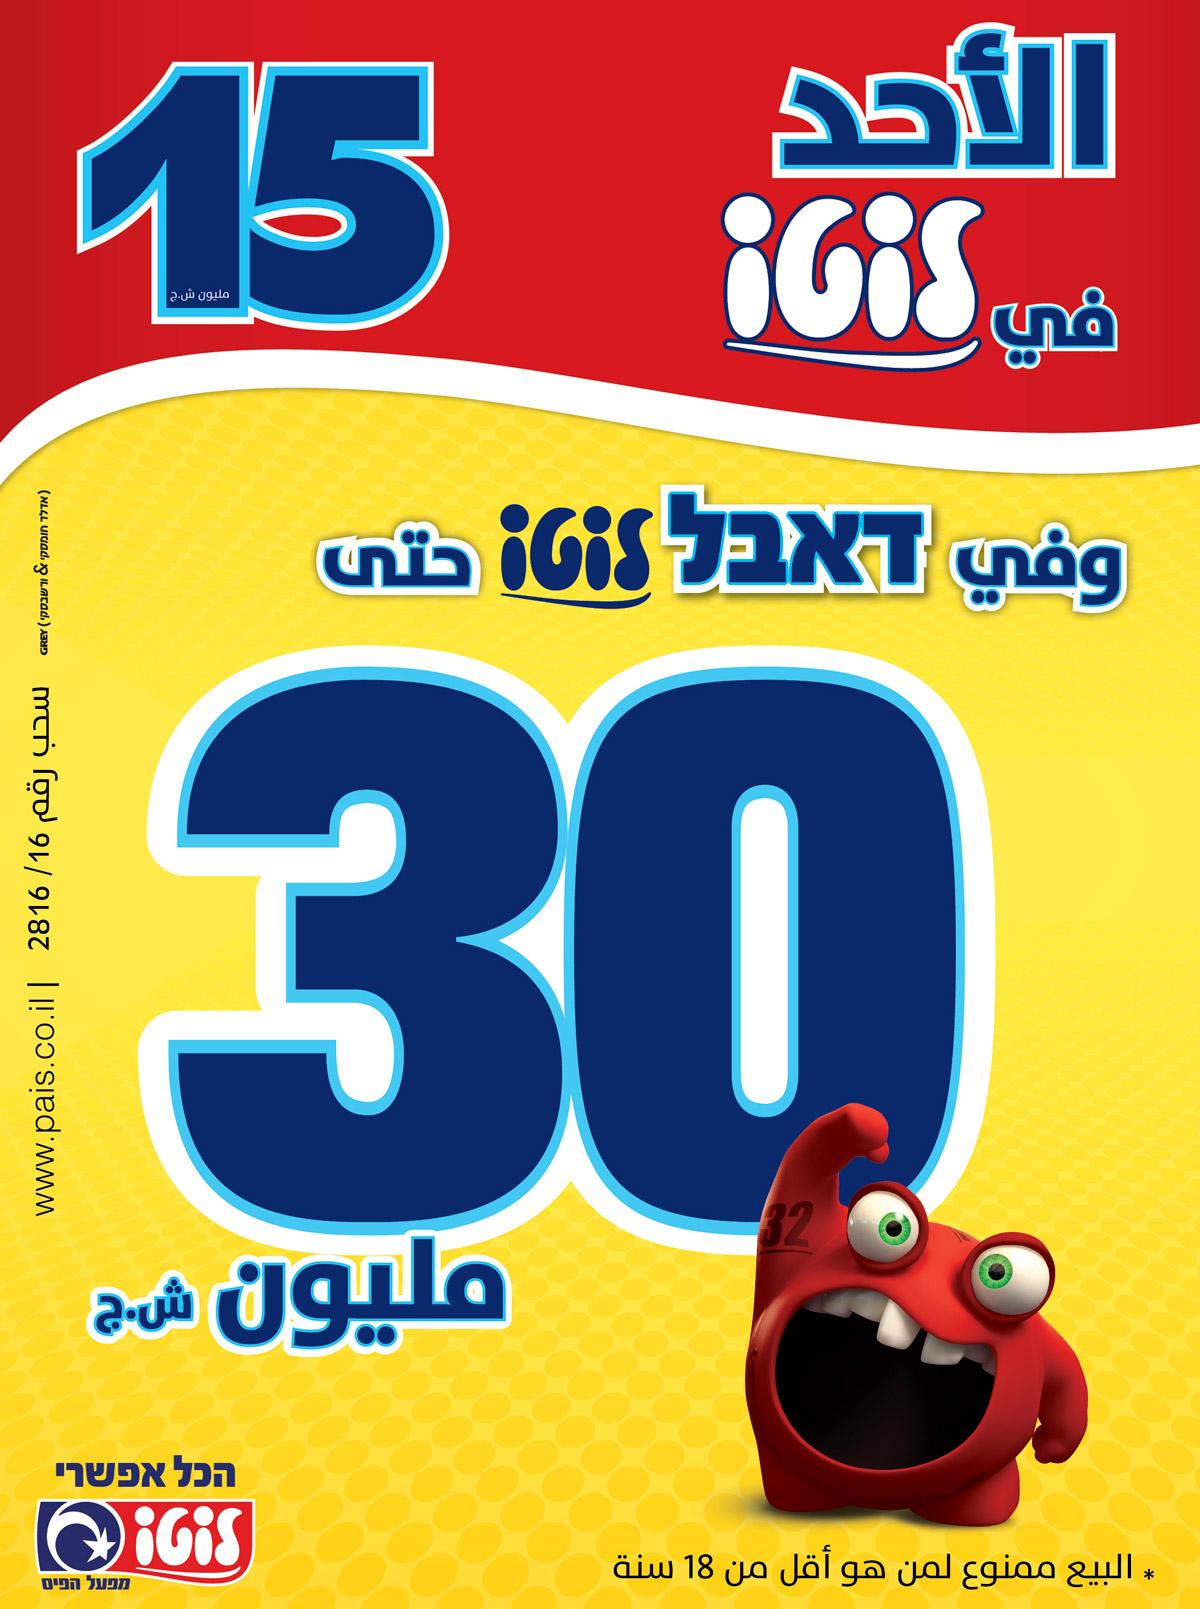 30-lotto-moda